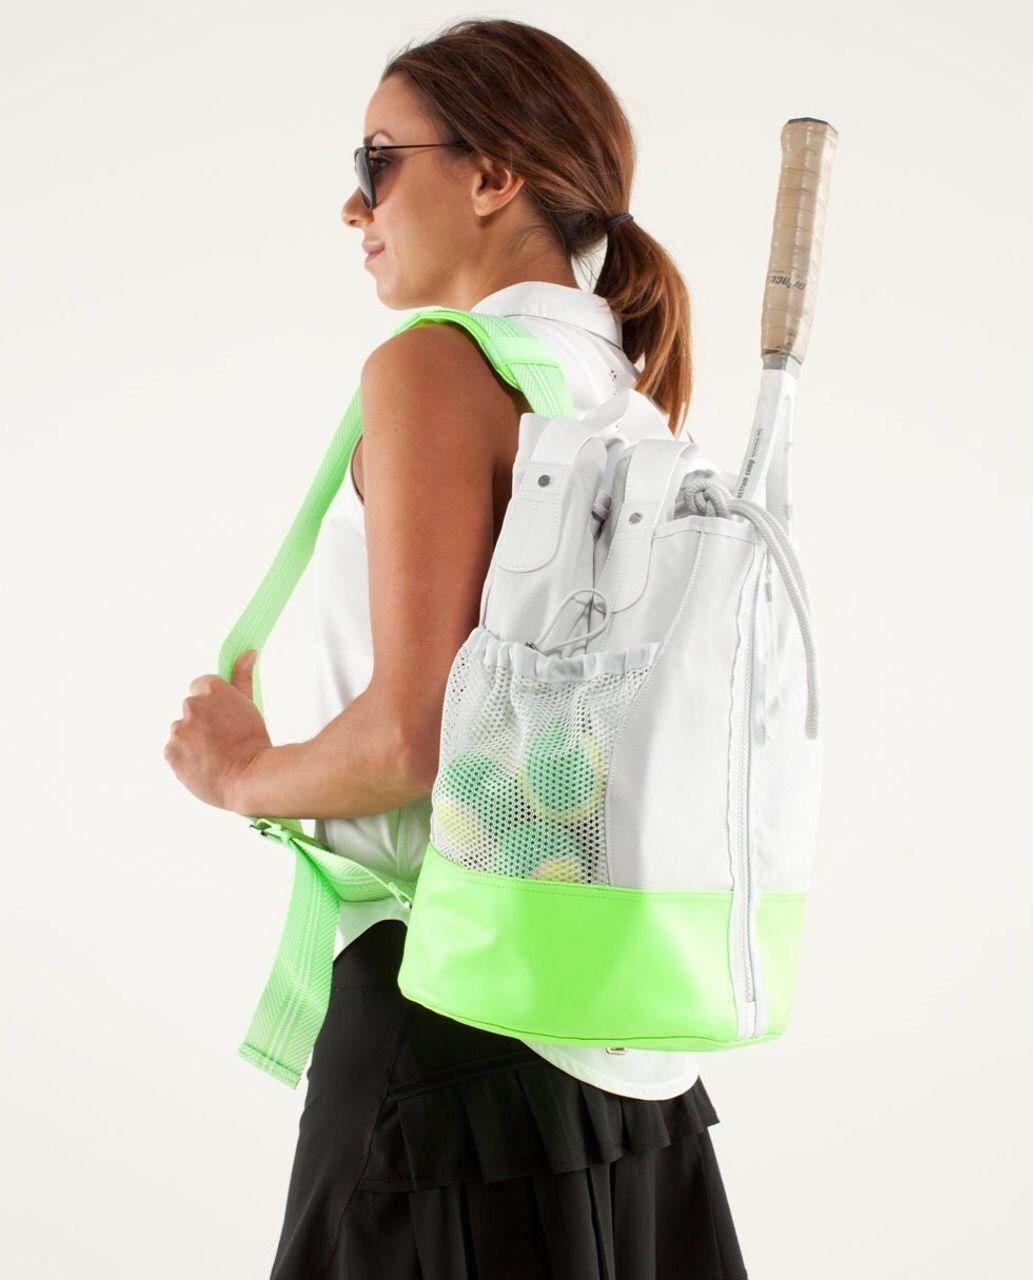 Lululemon Rally Tennis Raquet Ball Bag One Shoulder Or Hand Carry Neon Green